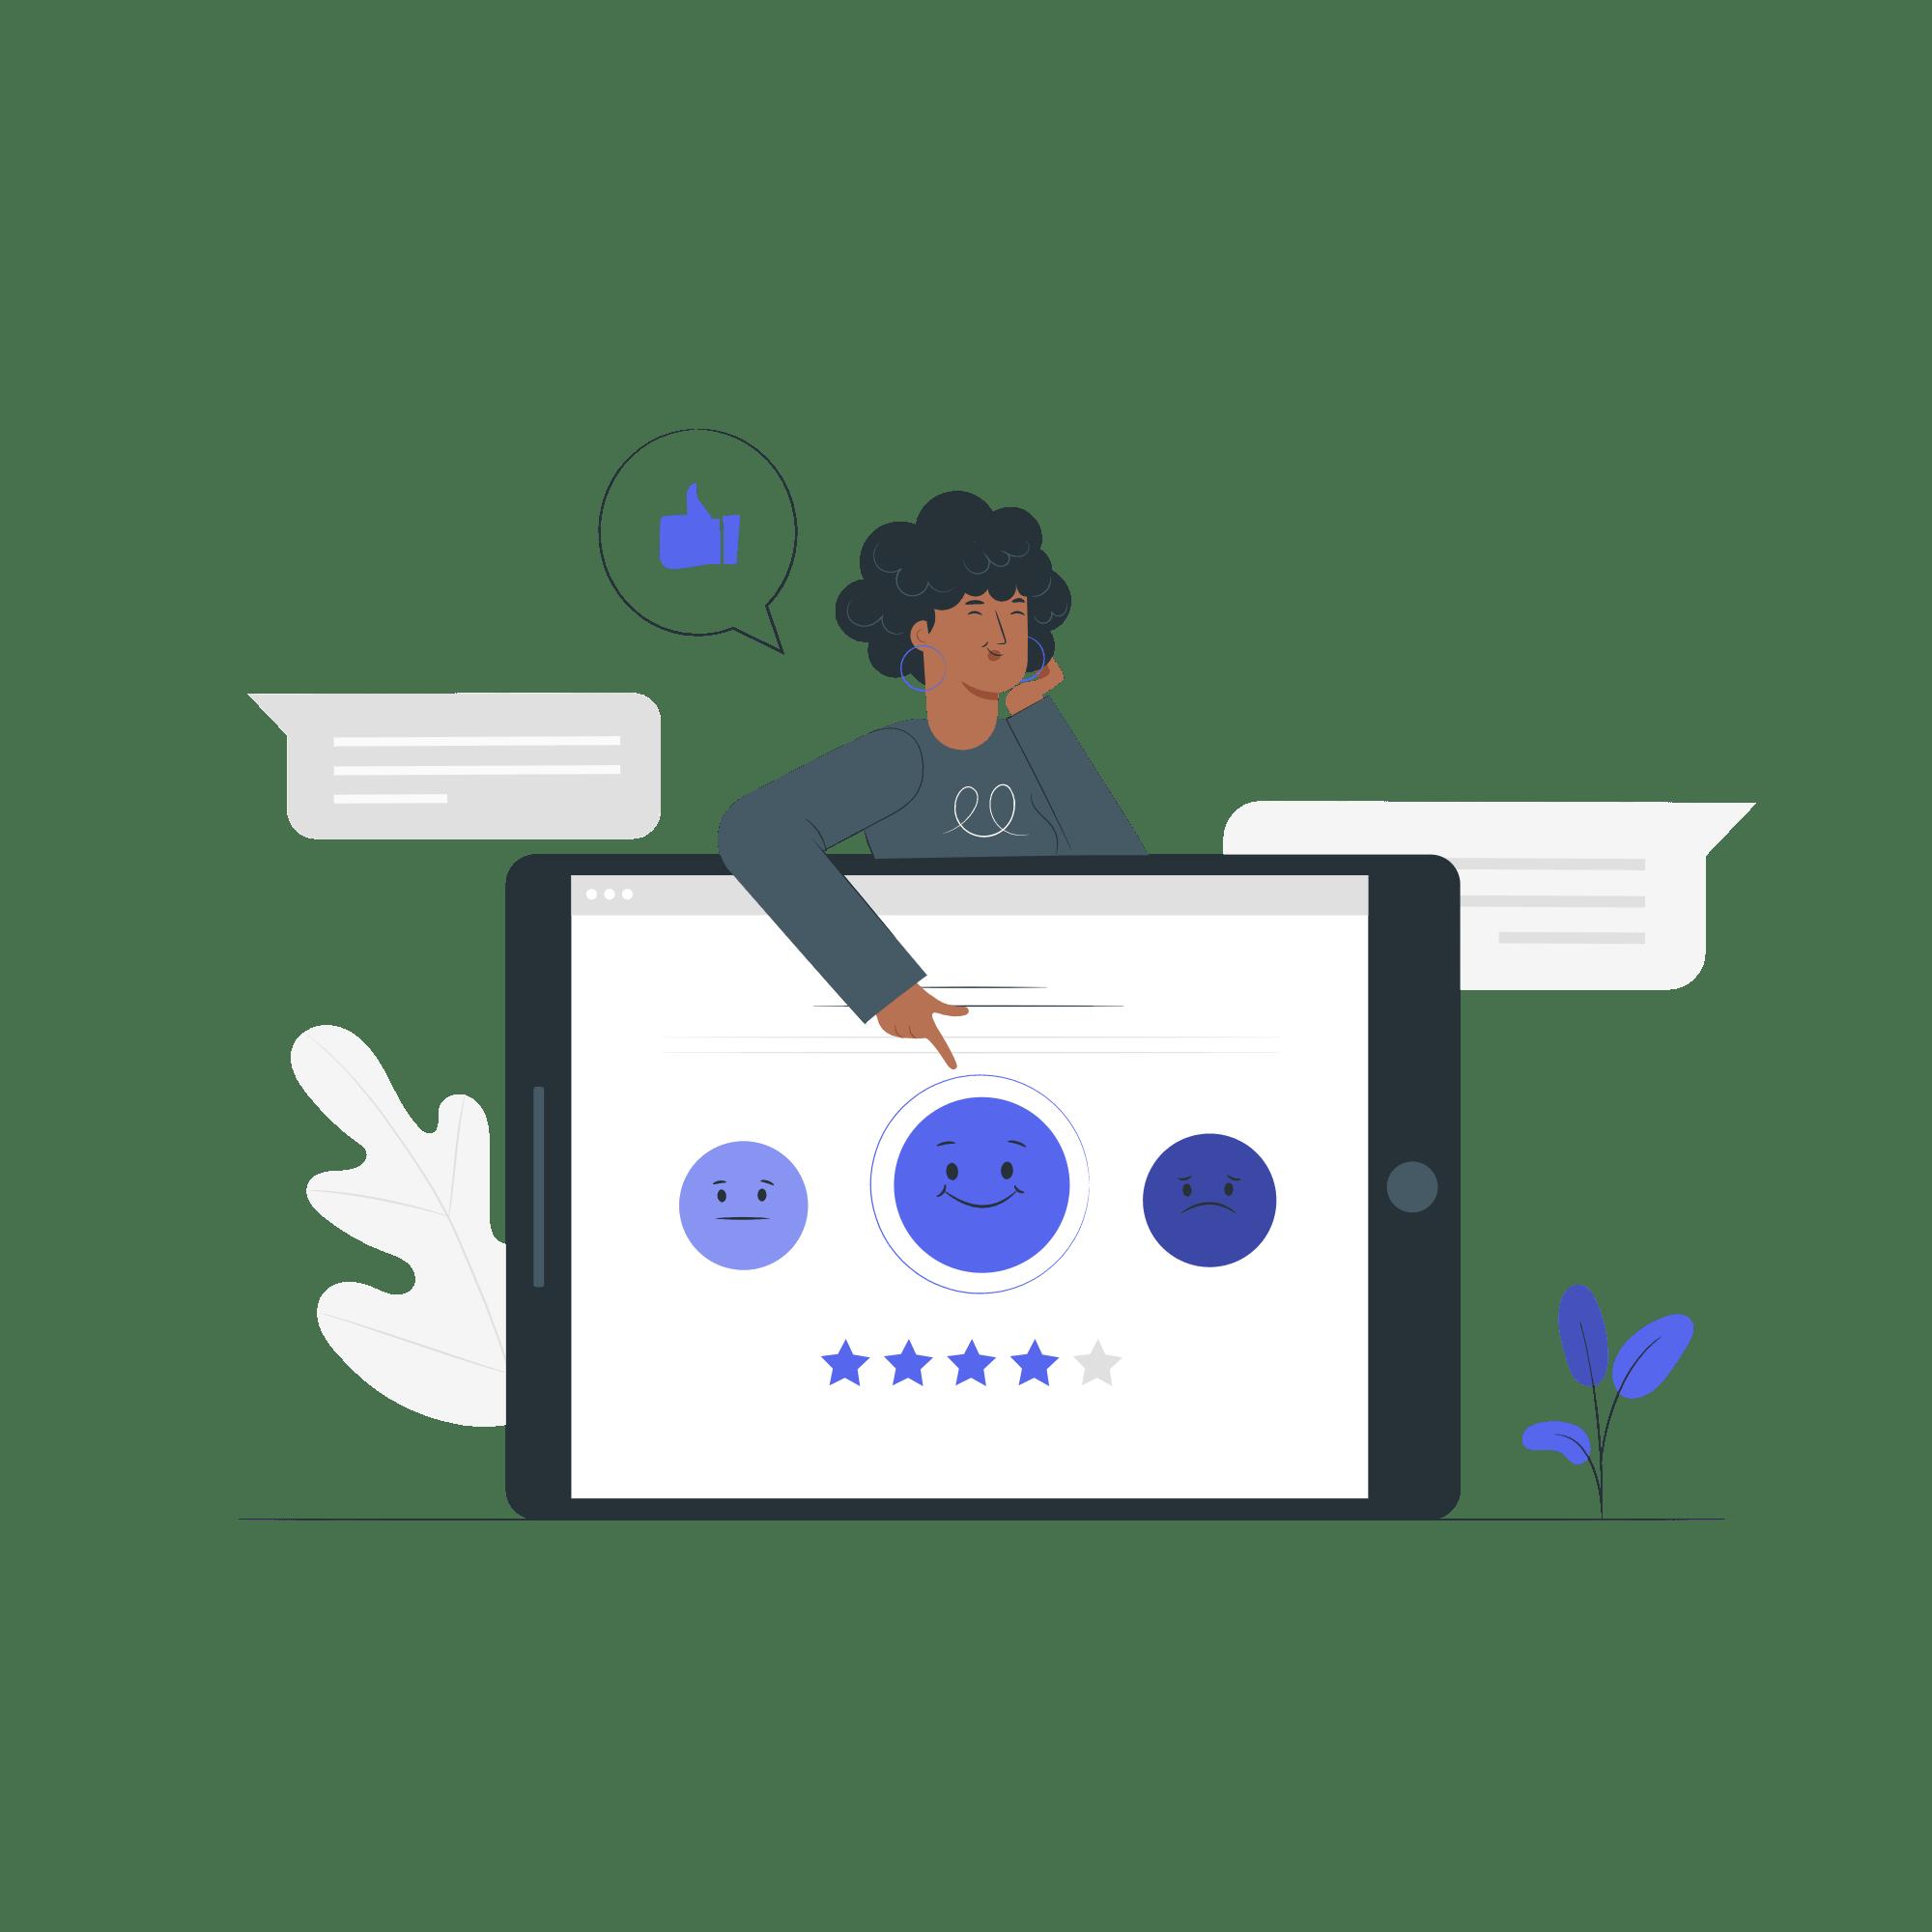 CS tools to improve customer satisfaction, reduce churn, and evaluate success metrics